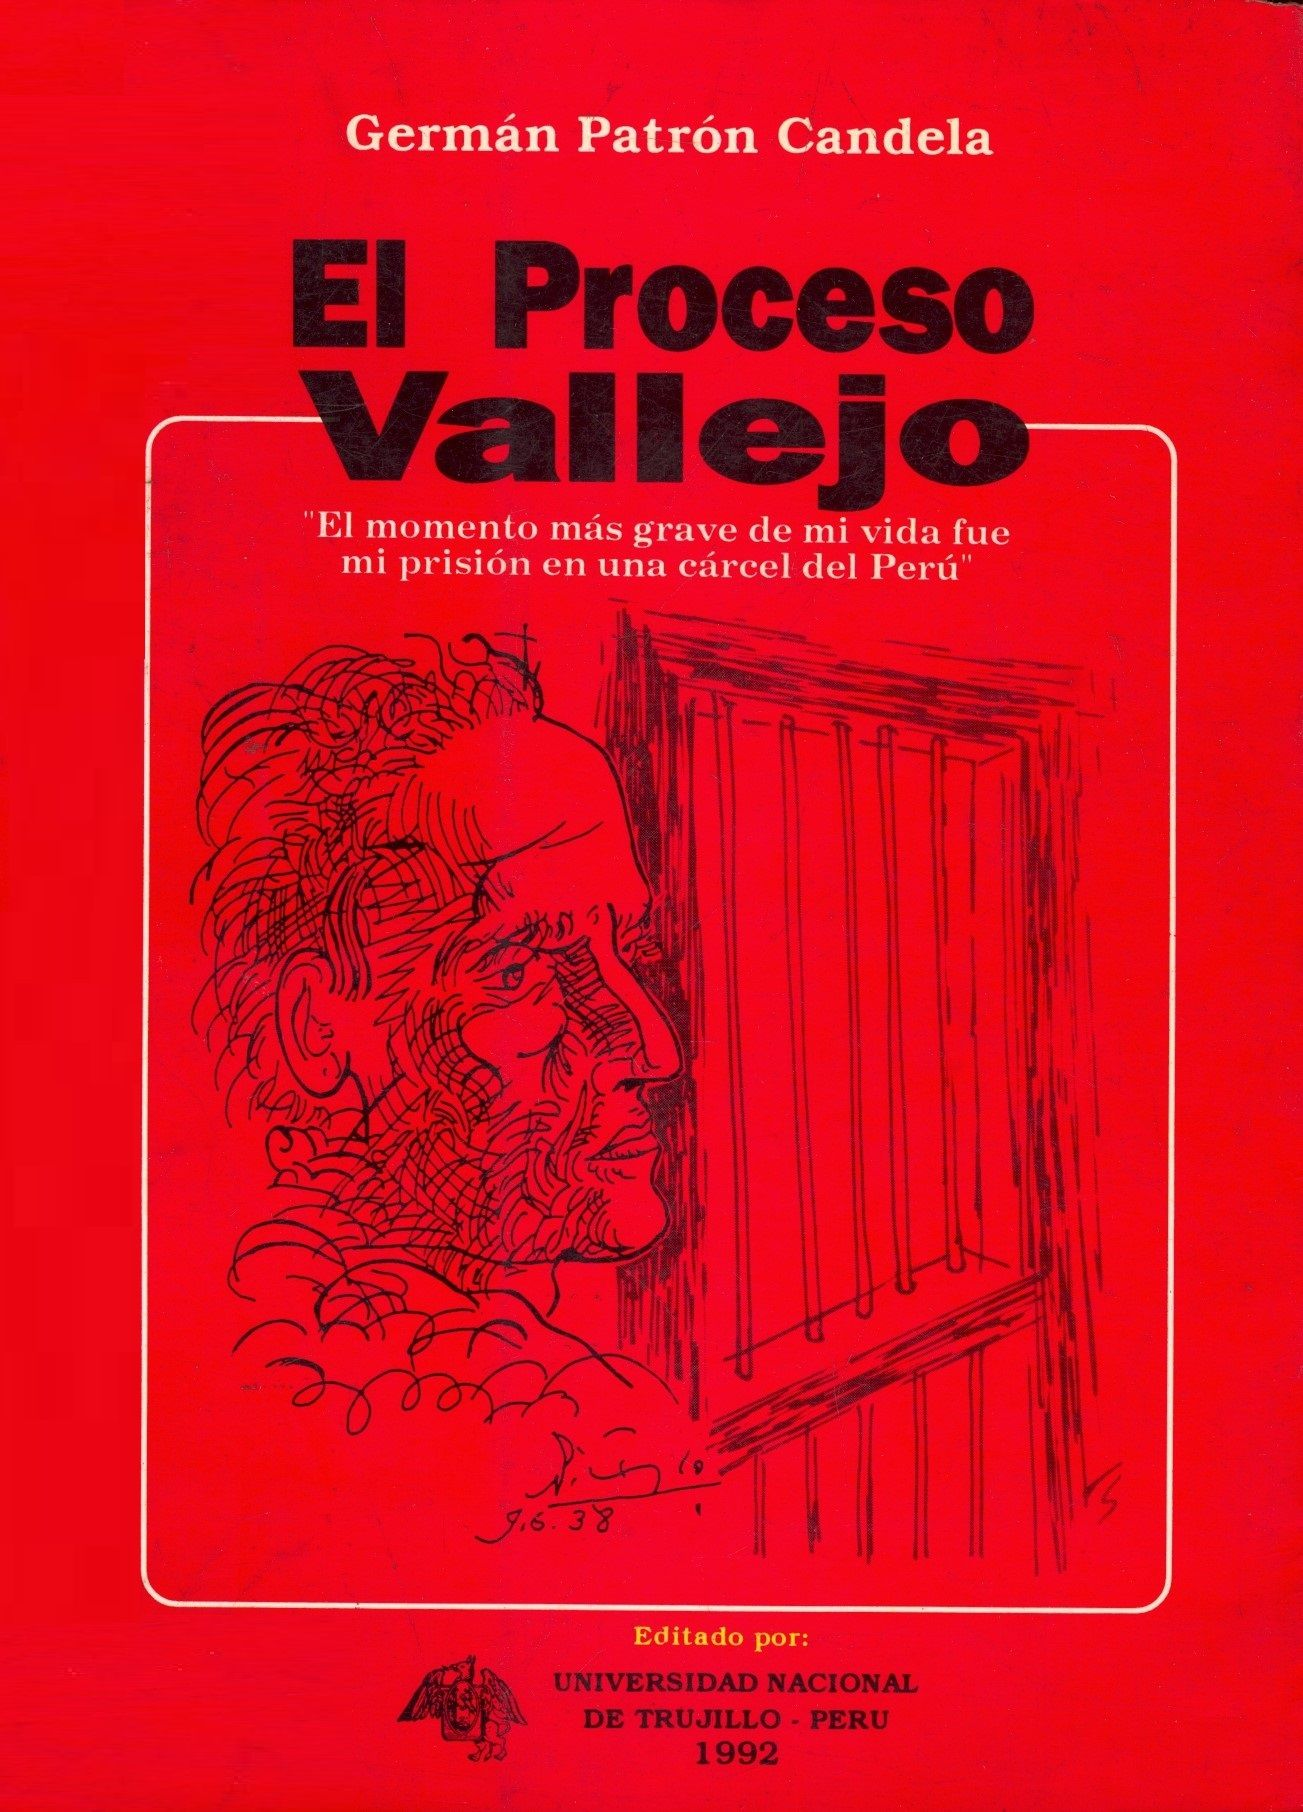 César Vallejo Poesía completa / PQ 8497.V35 O26P T.2